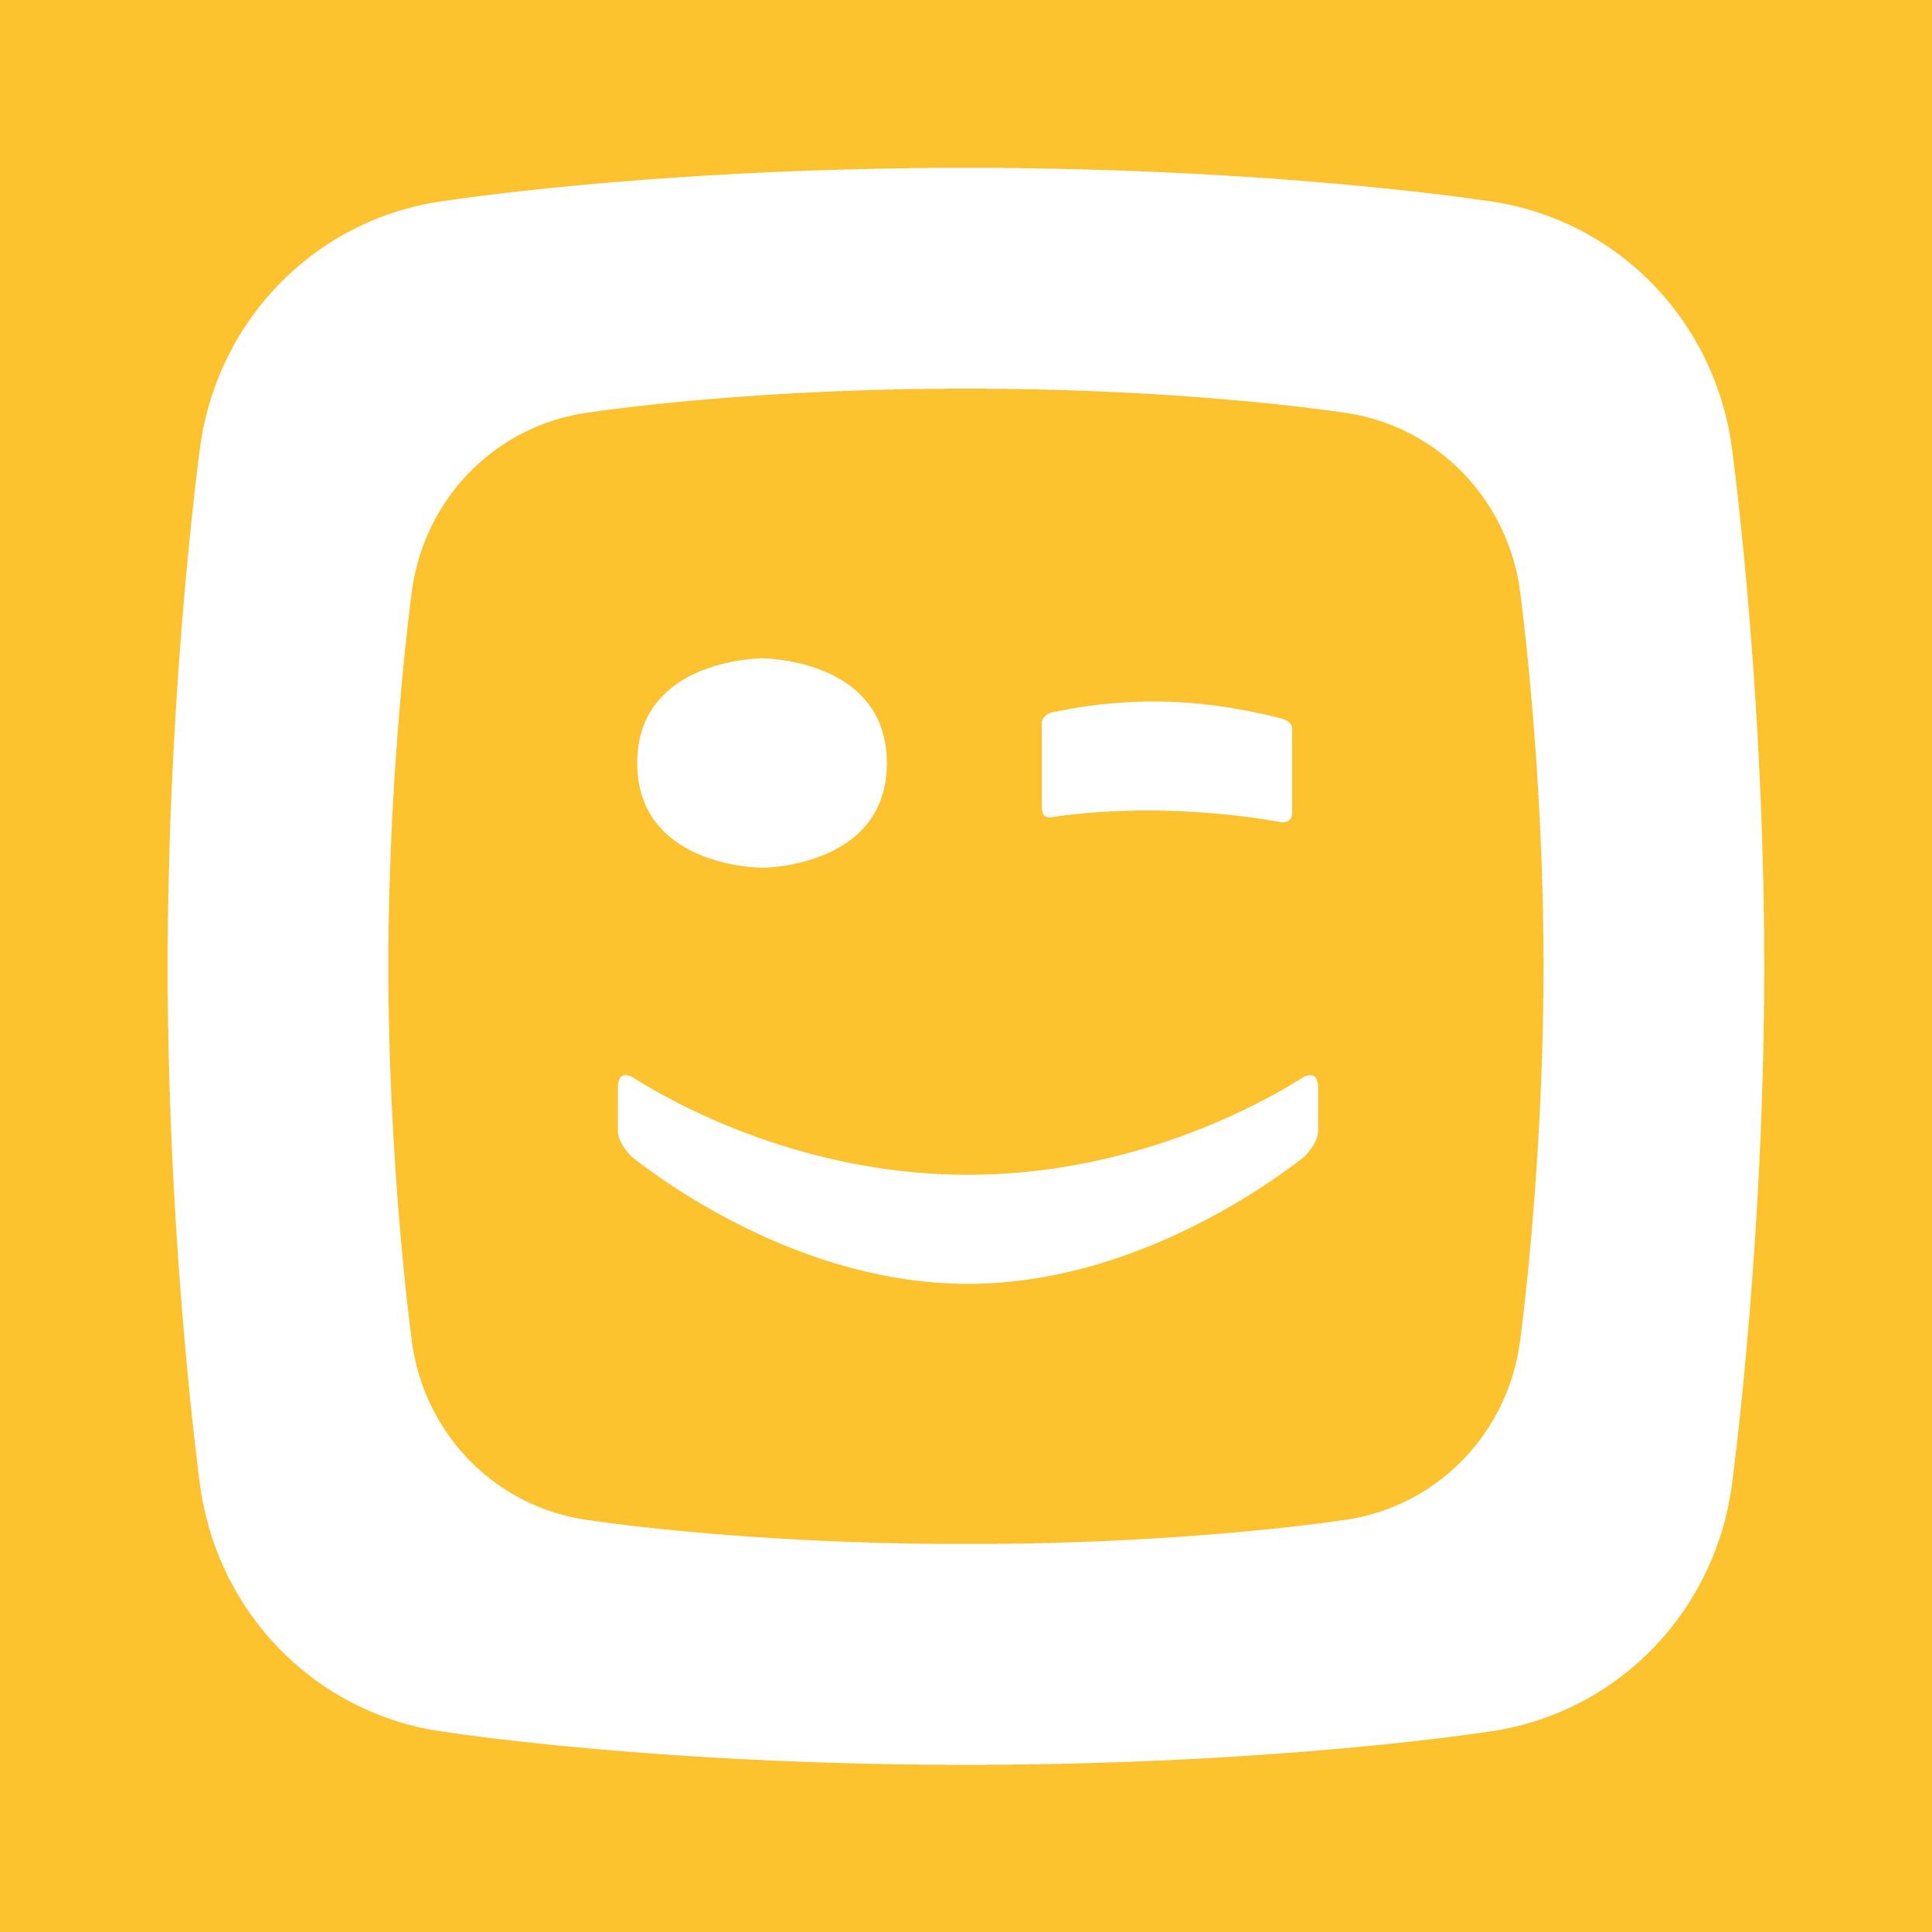 Telenet logo clipart svg transparent Telenet Logos svg transparent